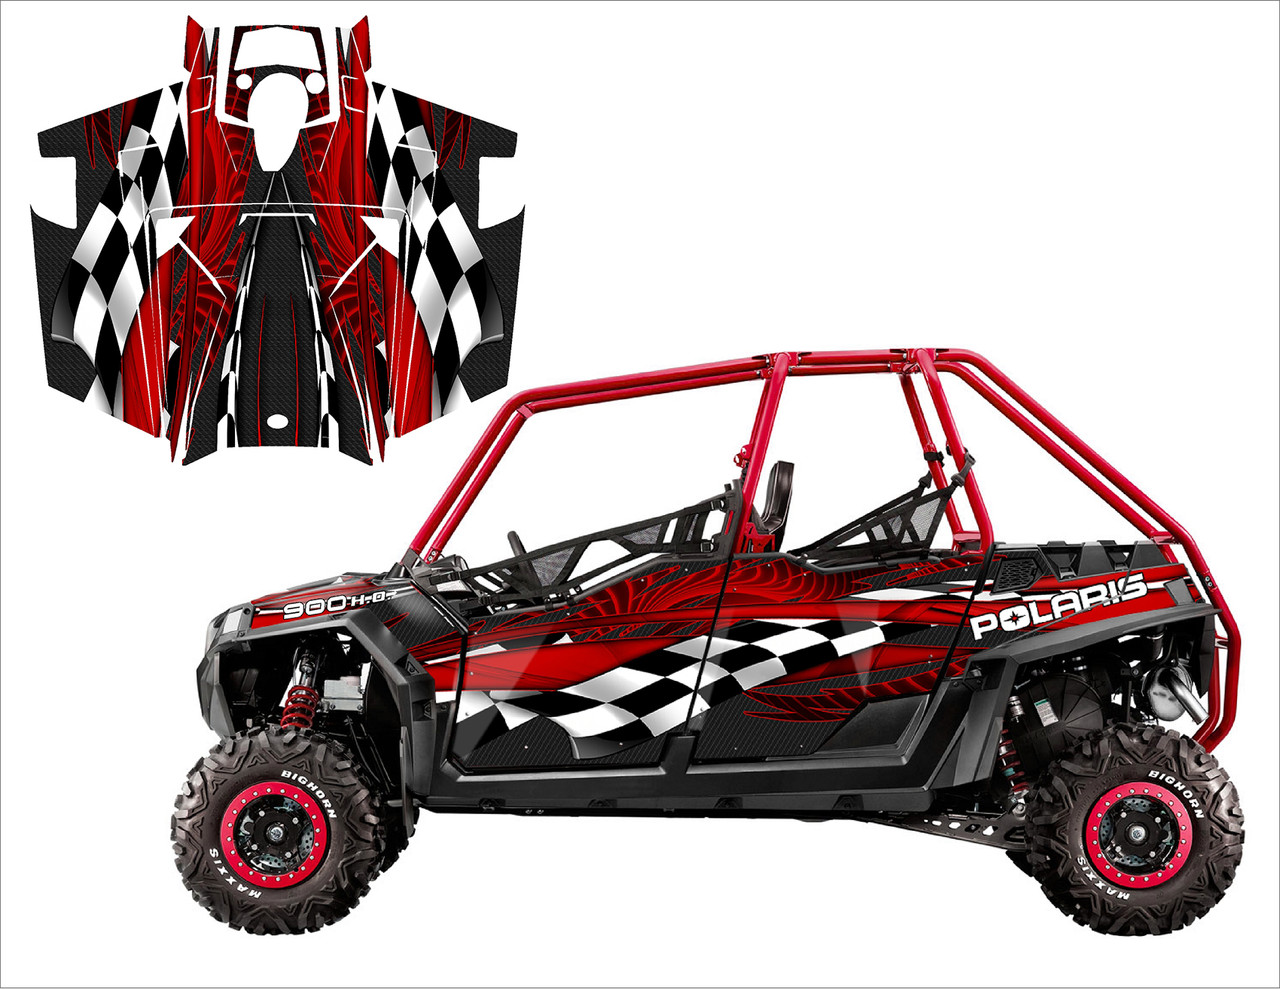 2011 RZR XP4 900 utv wrap kit with red checker design